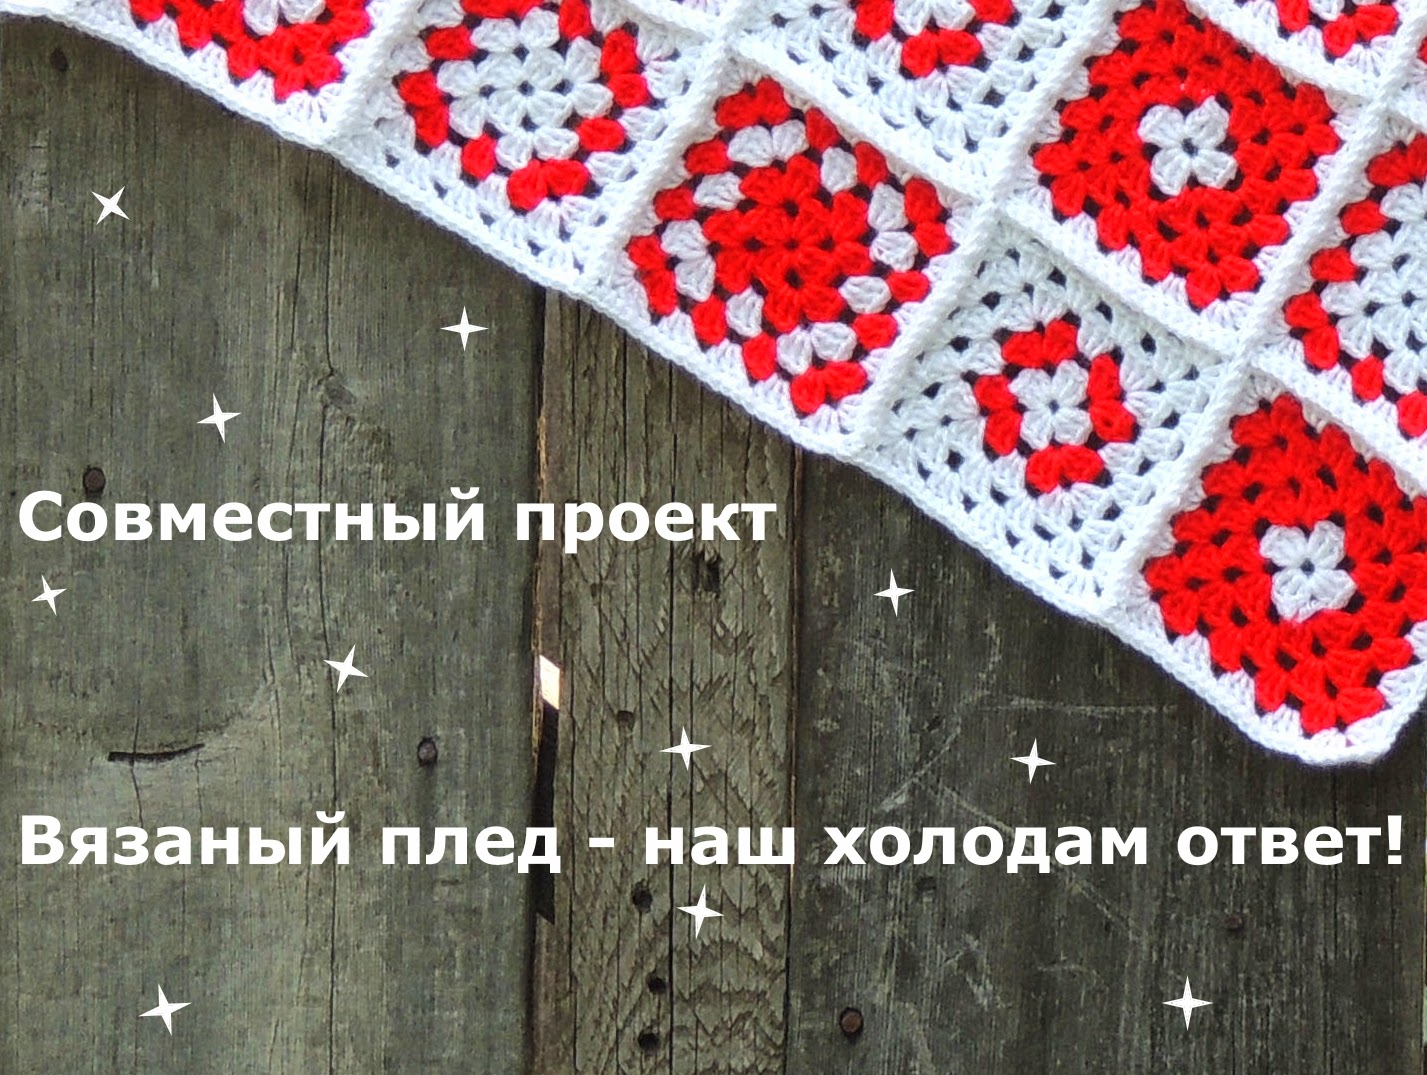 http://www.roventa-handmade.com/2014/08/CP-vyazaniy-pled.html